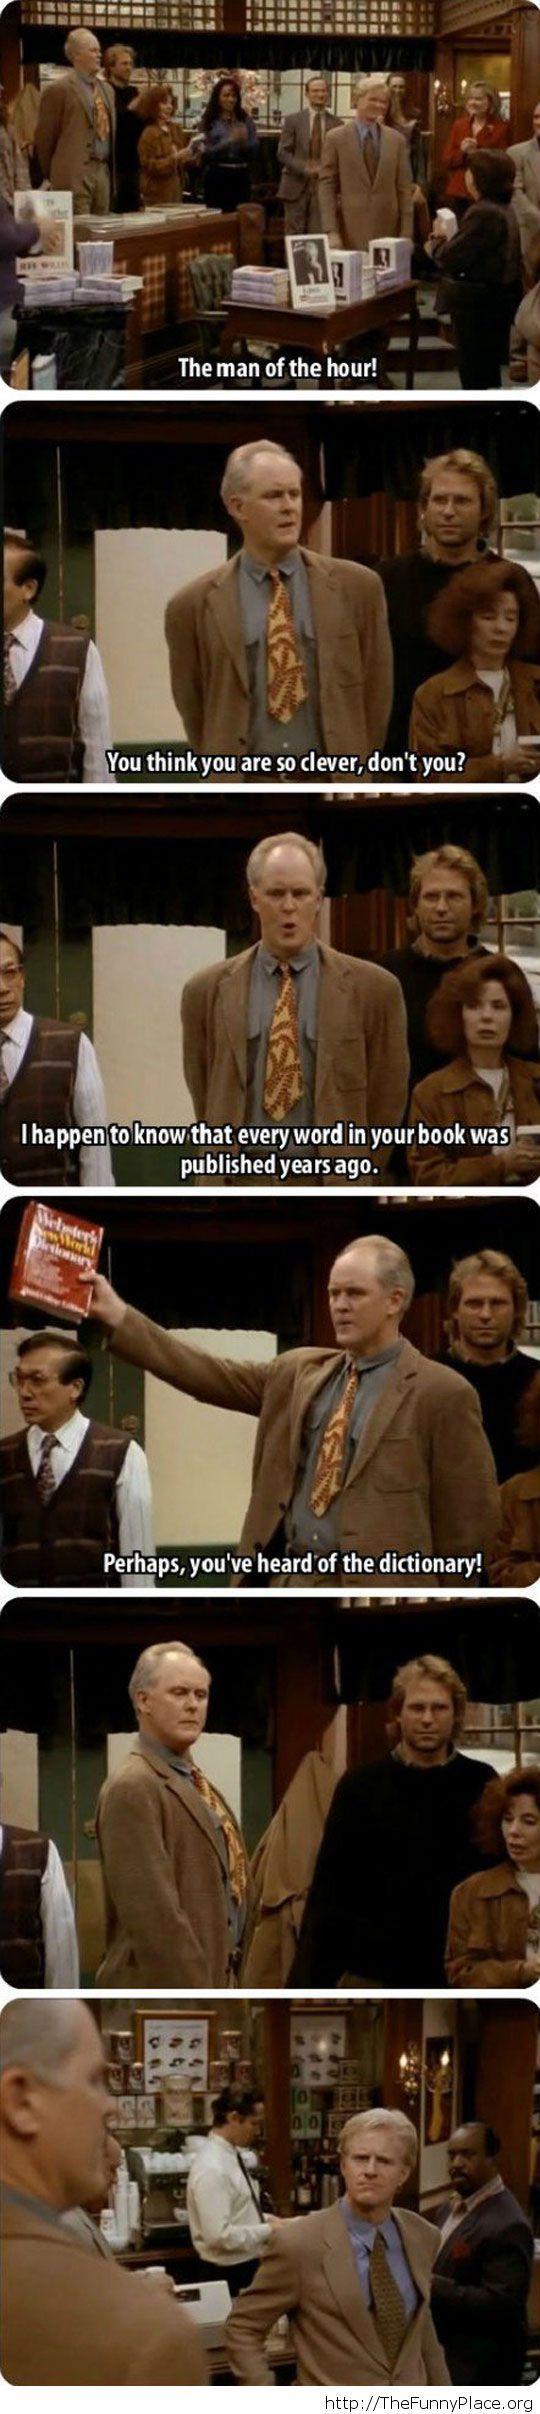 Funny book line